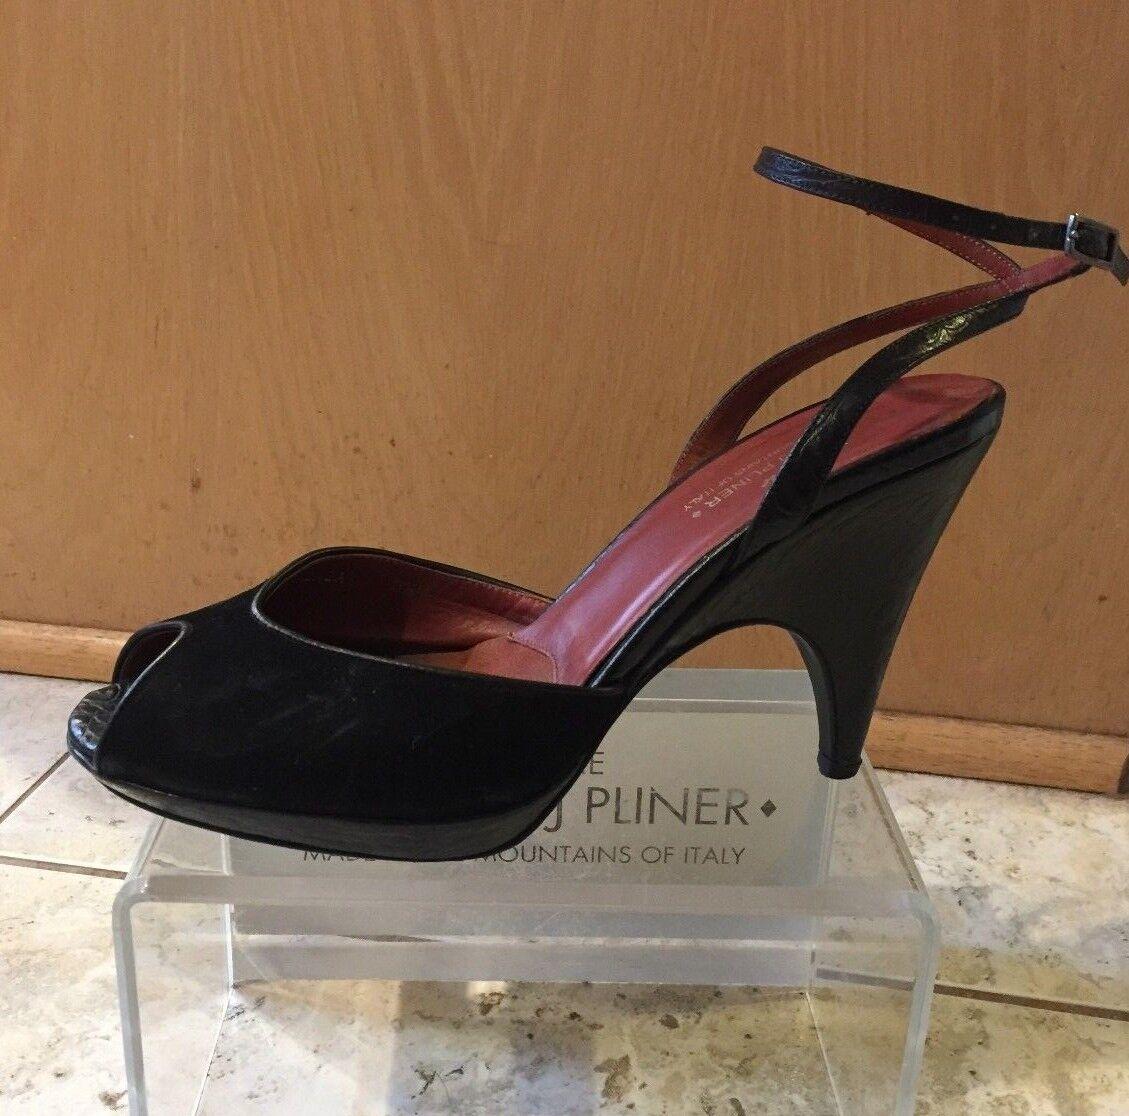 Donald Pliner Couture Gator Leder Schuhe Open-Toe Platform Ankle Wrap 275 8.5